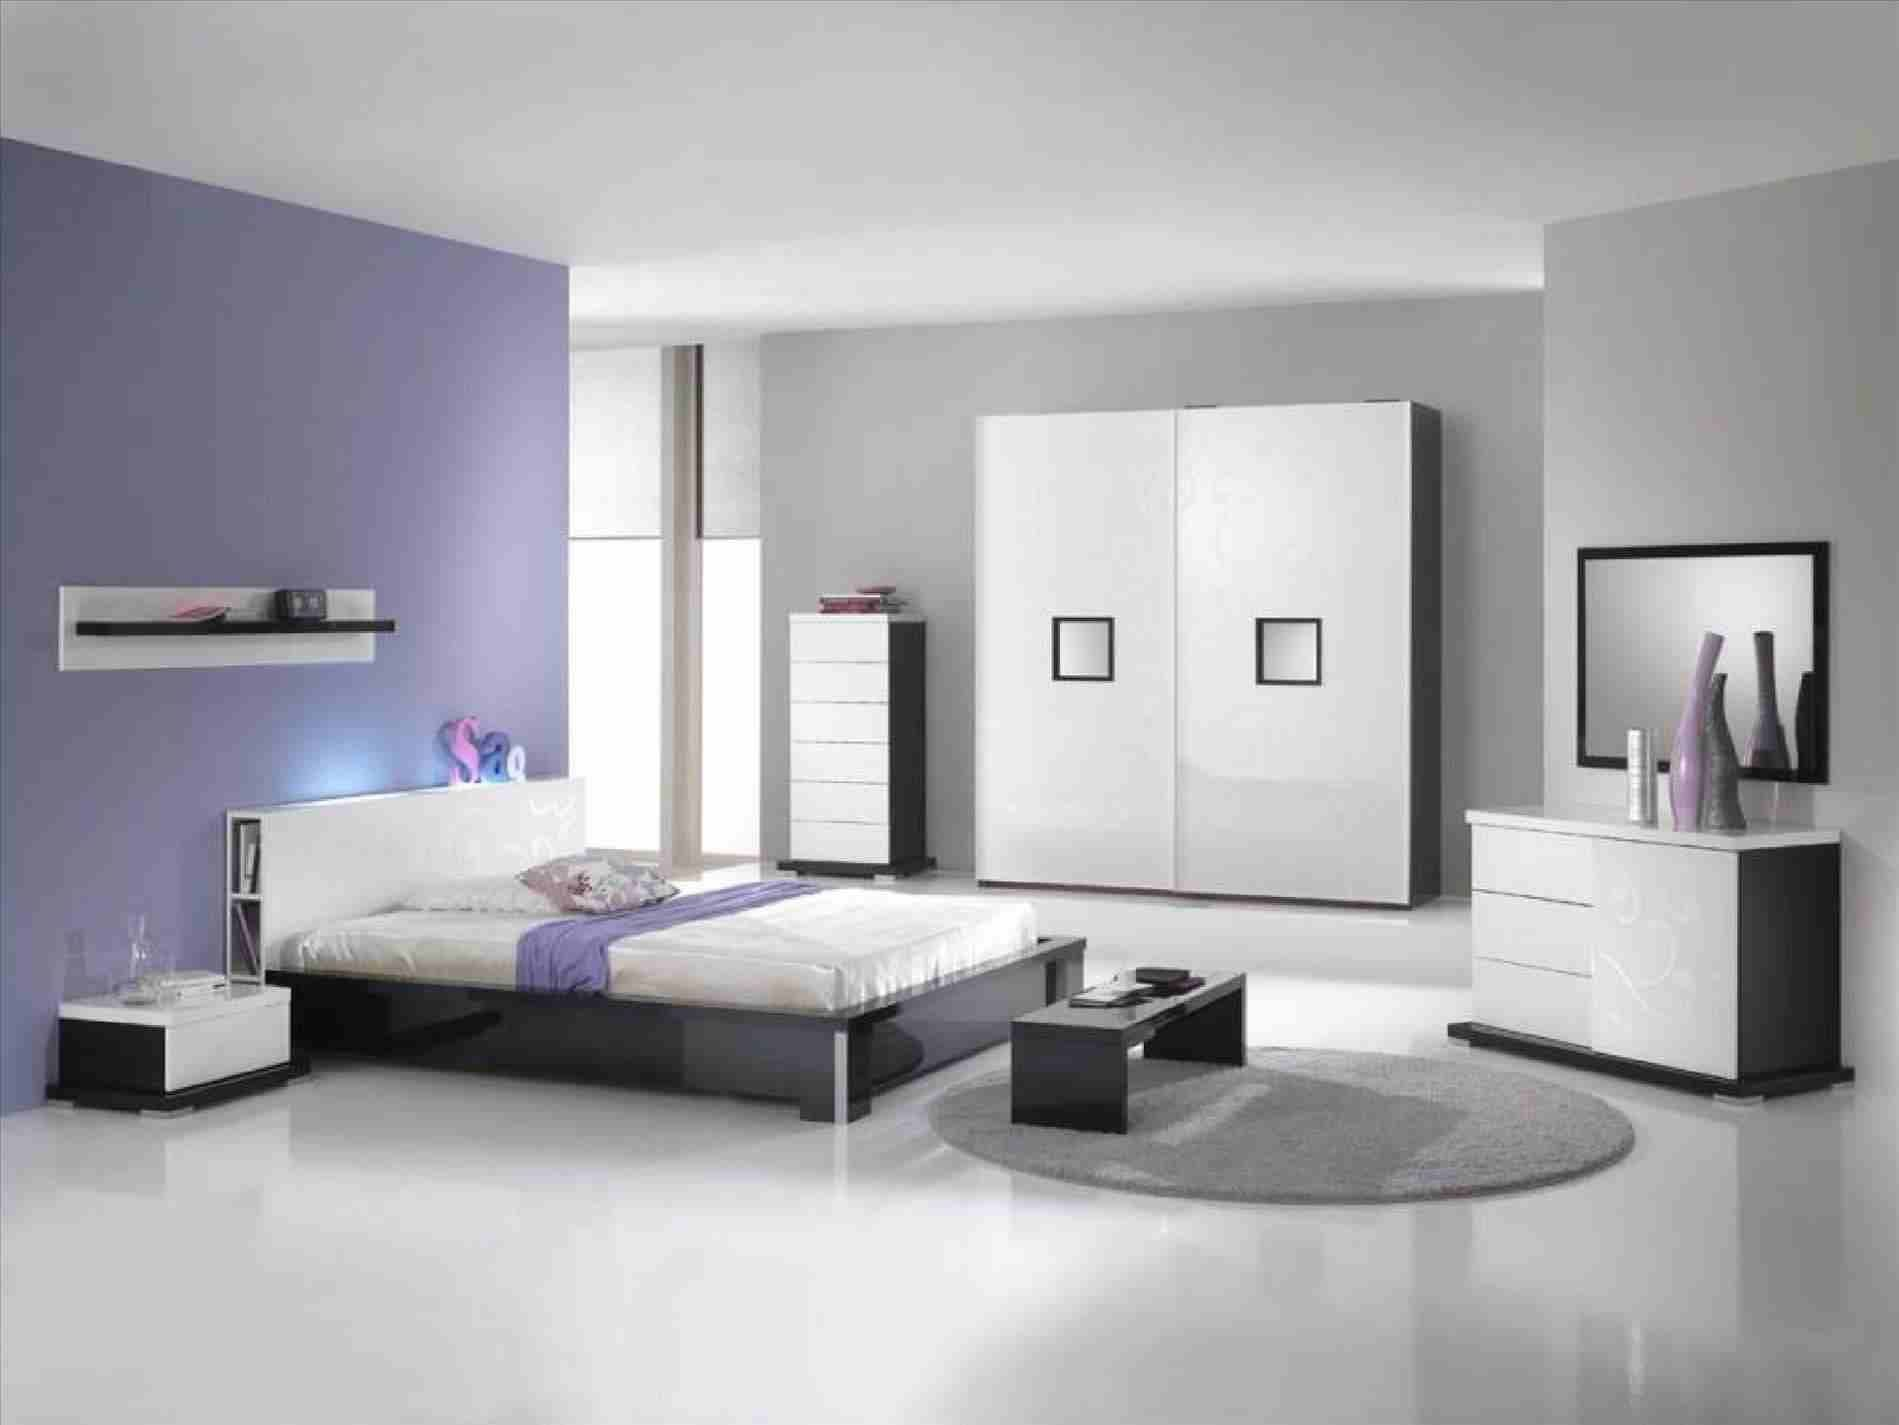 Modern Italian Bedroom Ideas - modern bed frame pcd homes modern ...